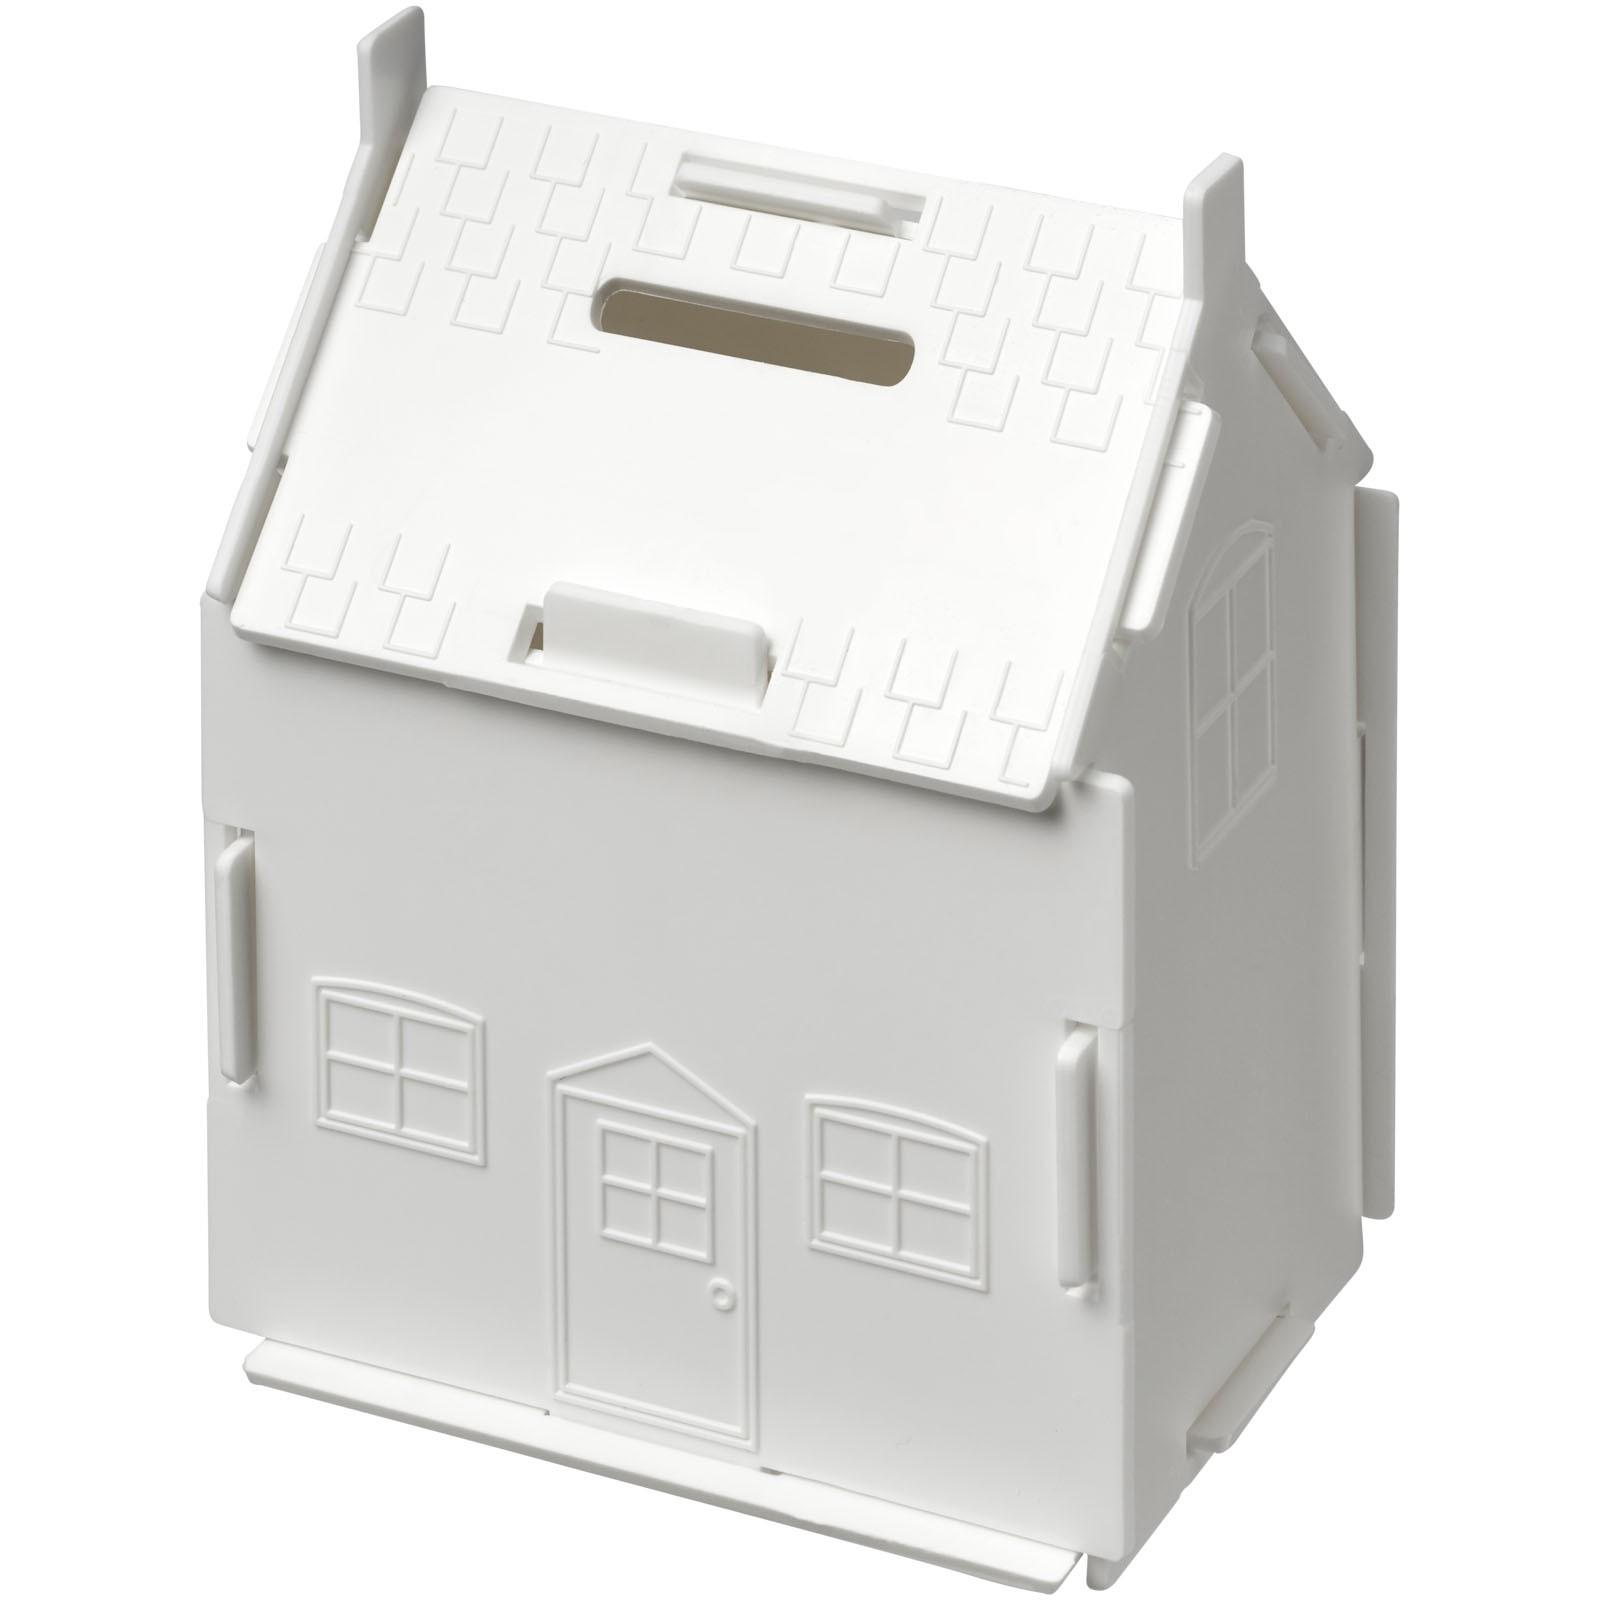 Plastová pokladnička Uri ve tvaru domu - Bílá